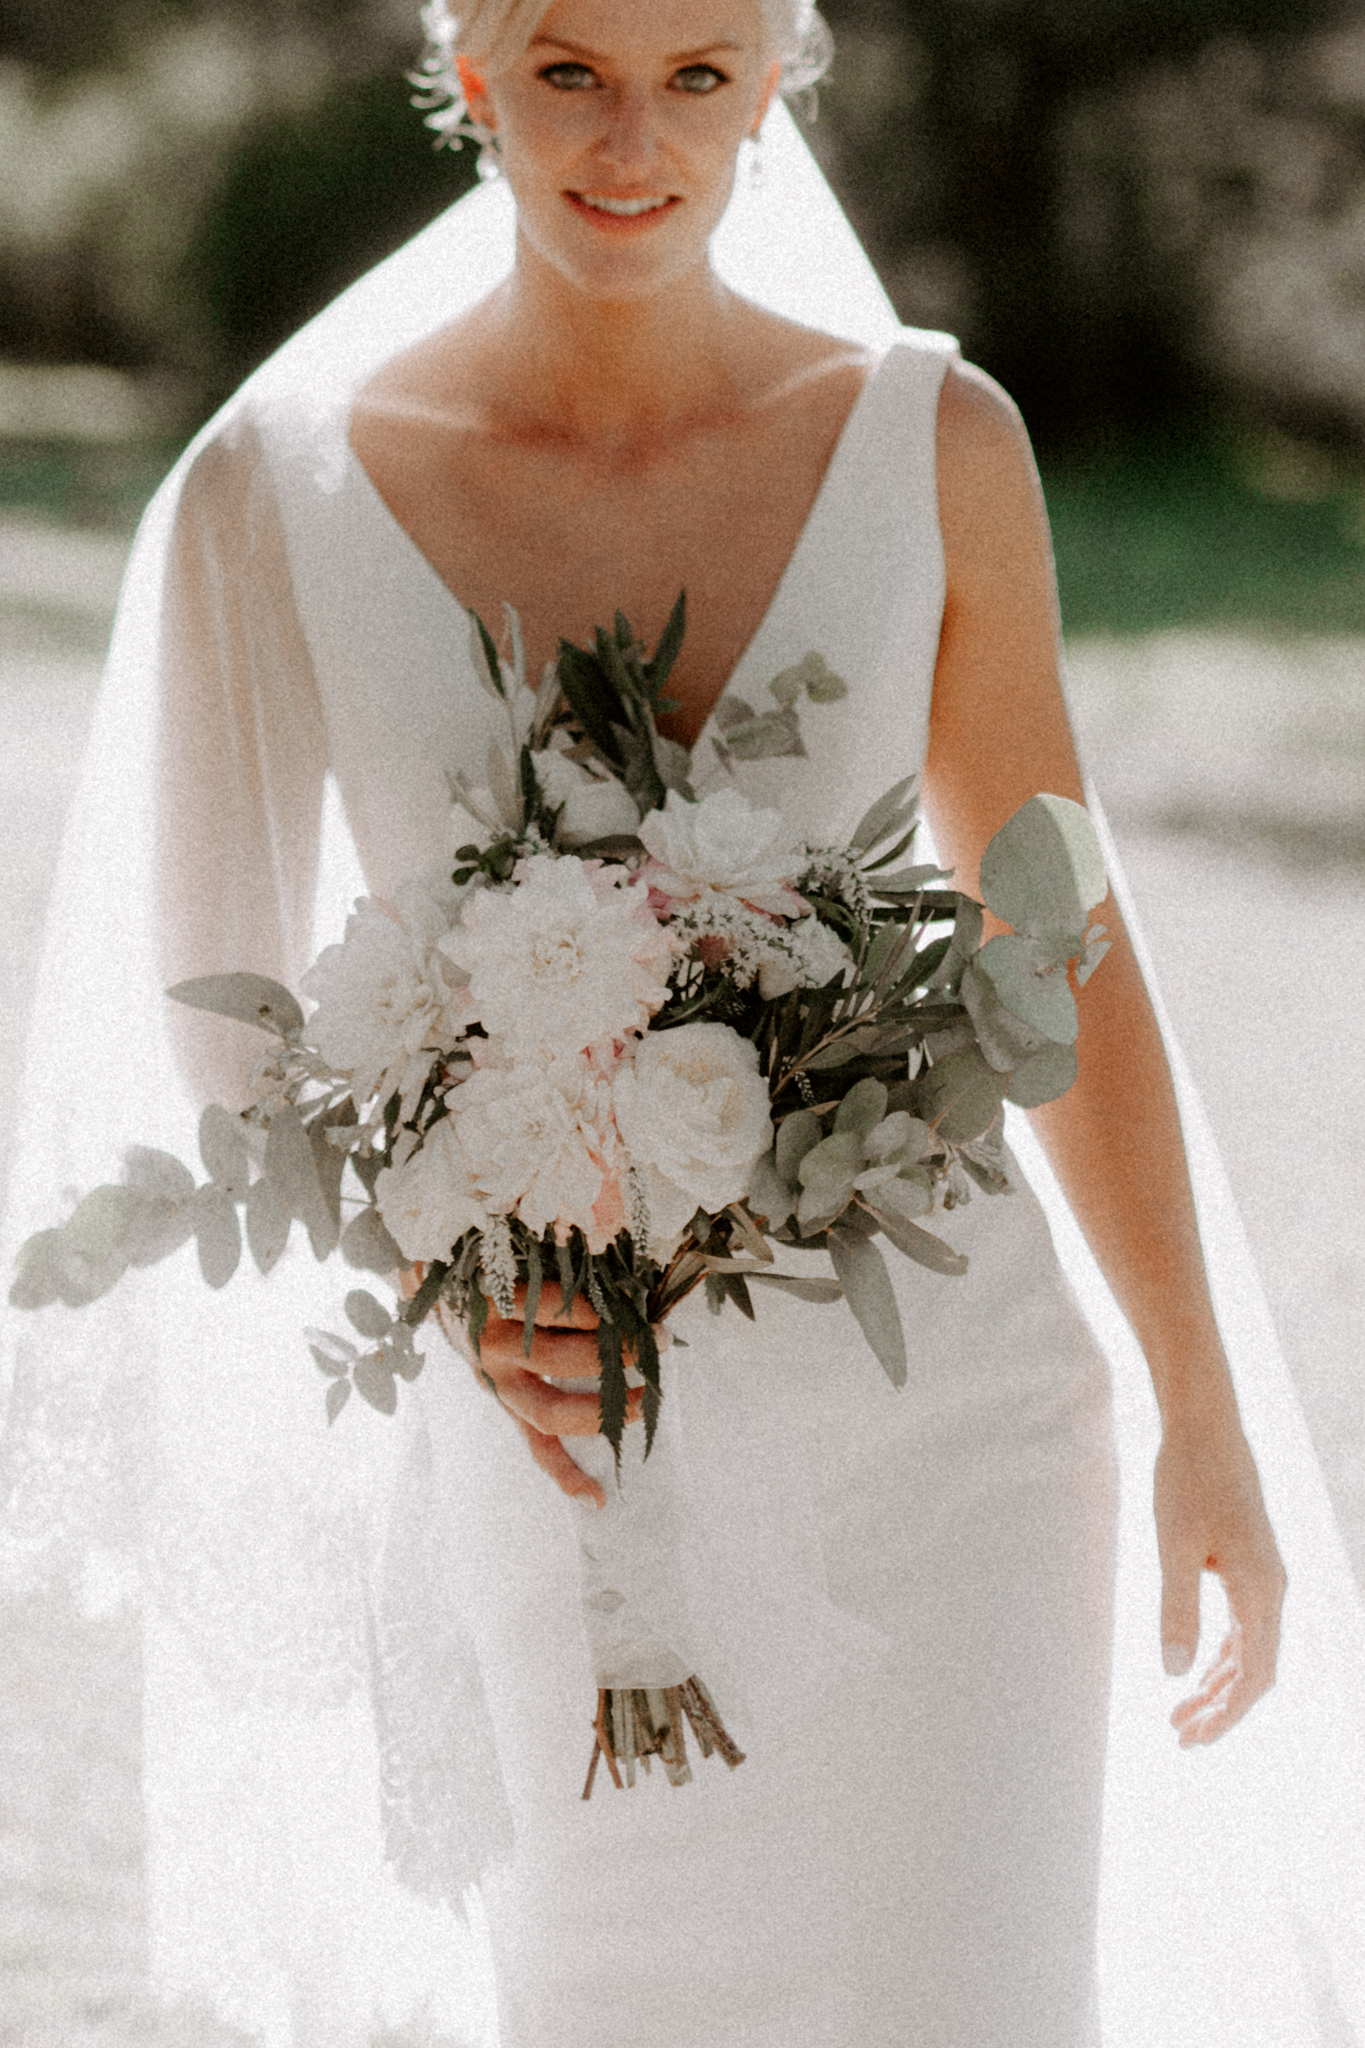 St-Kilda-Garden-Wedding-Emotions-and-Math-Photograph-142.jpg